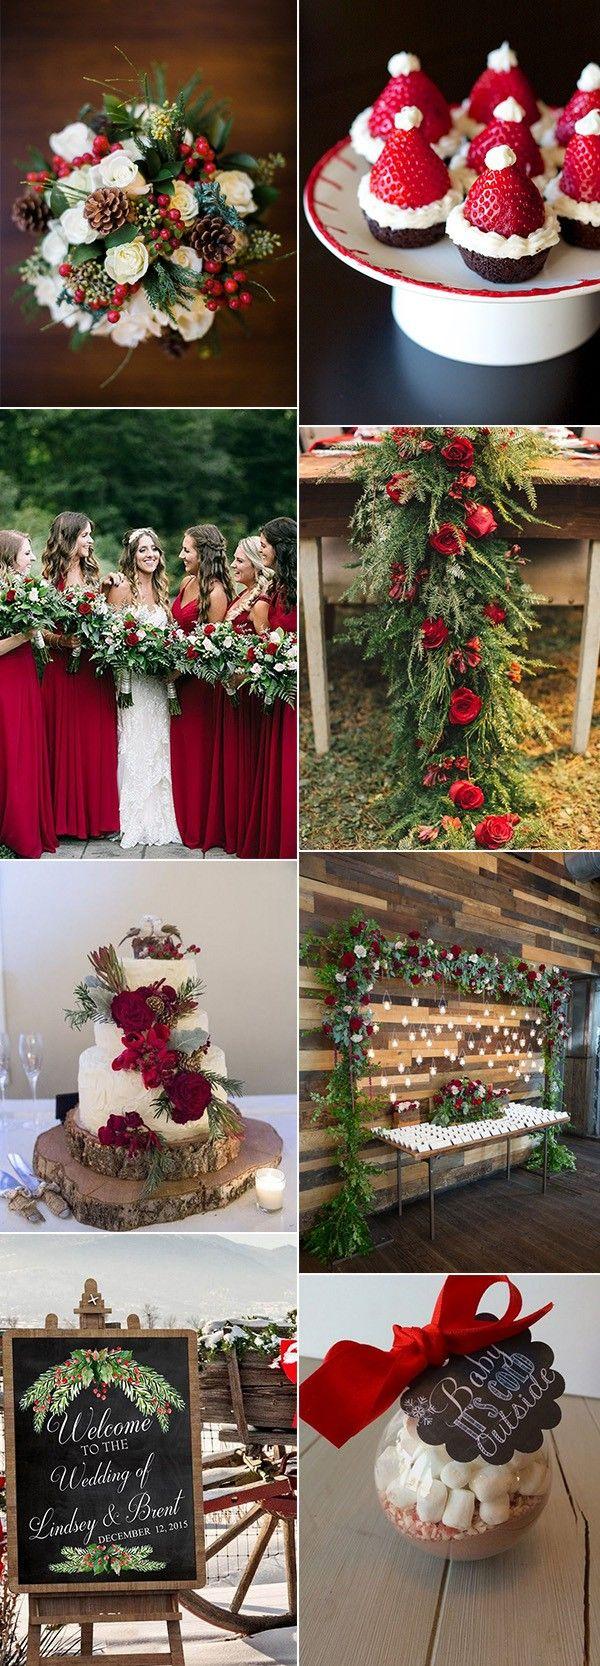 Christmas themed wedding ideas for winter